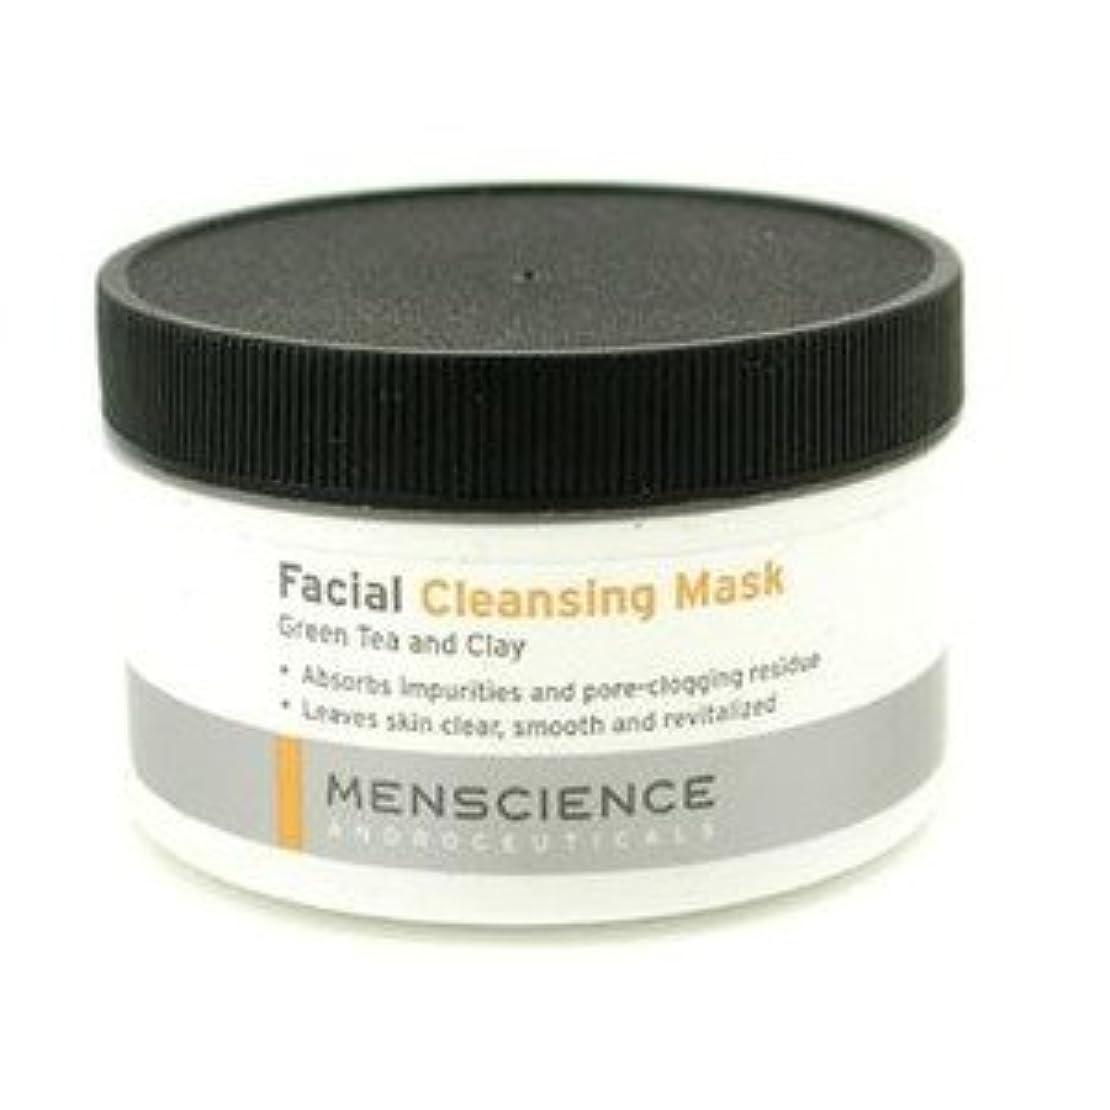 MenScience フェーシャル クリーニング マスク - グリーンティー&クレイ 90g/3oz [並行輸入品]